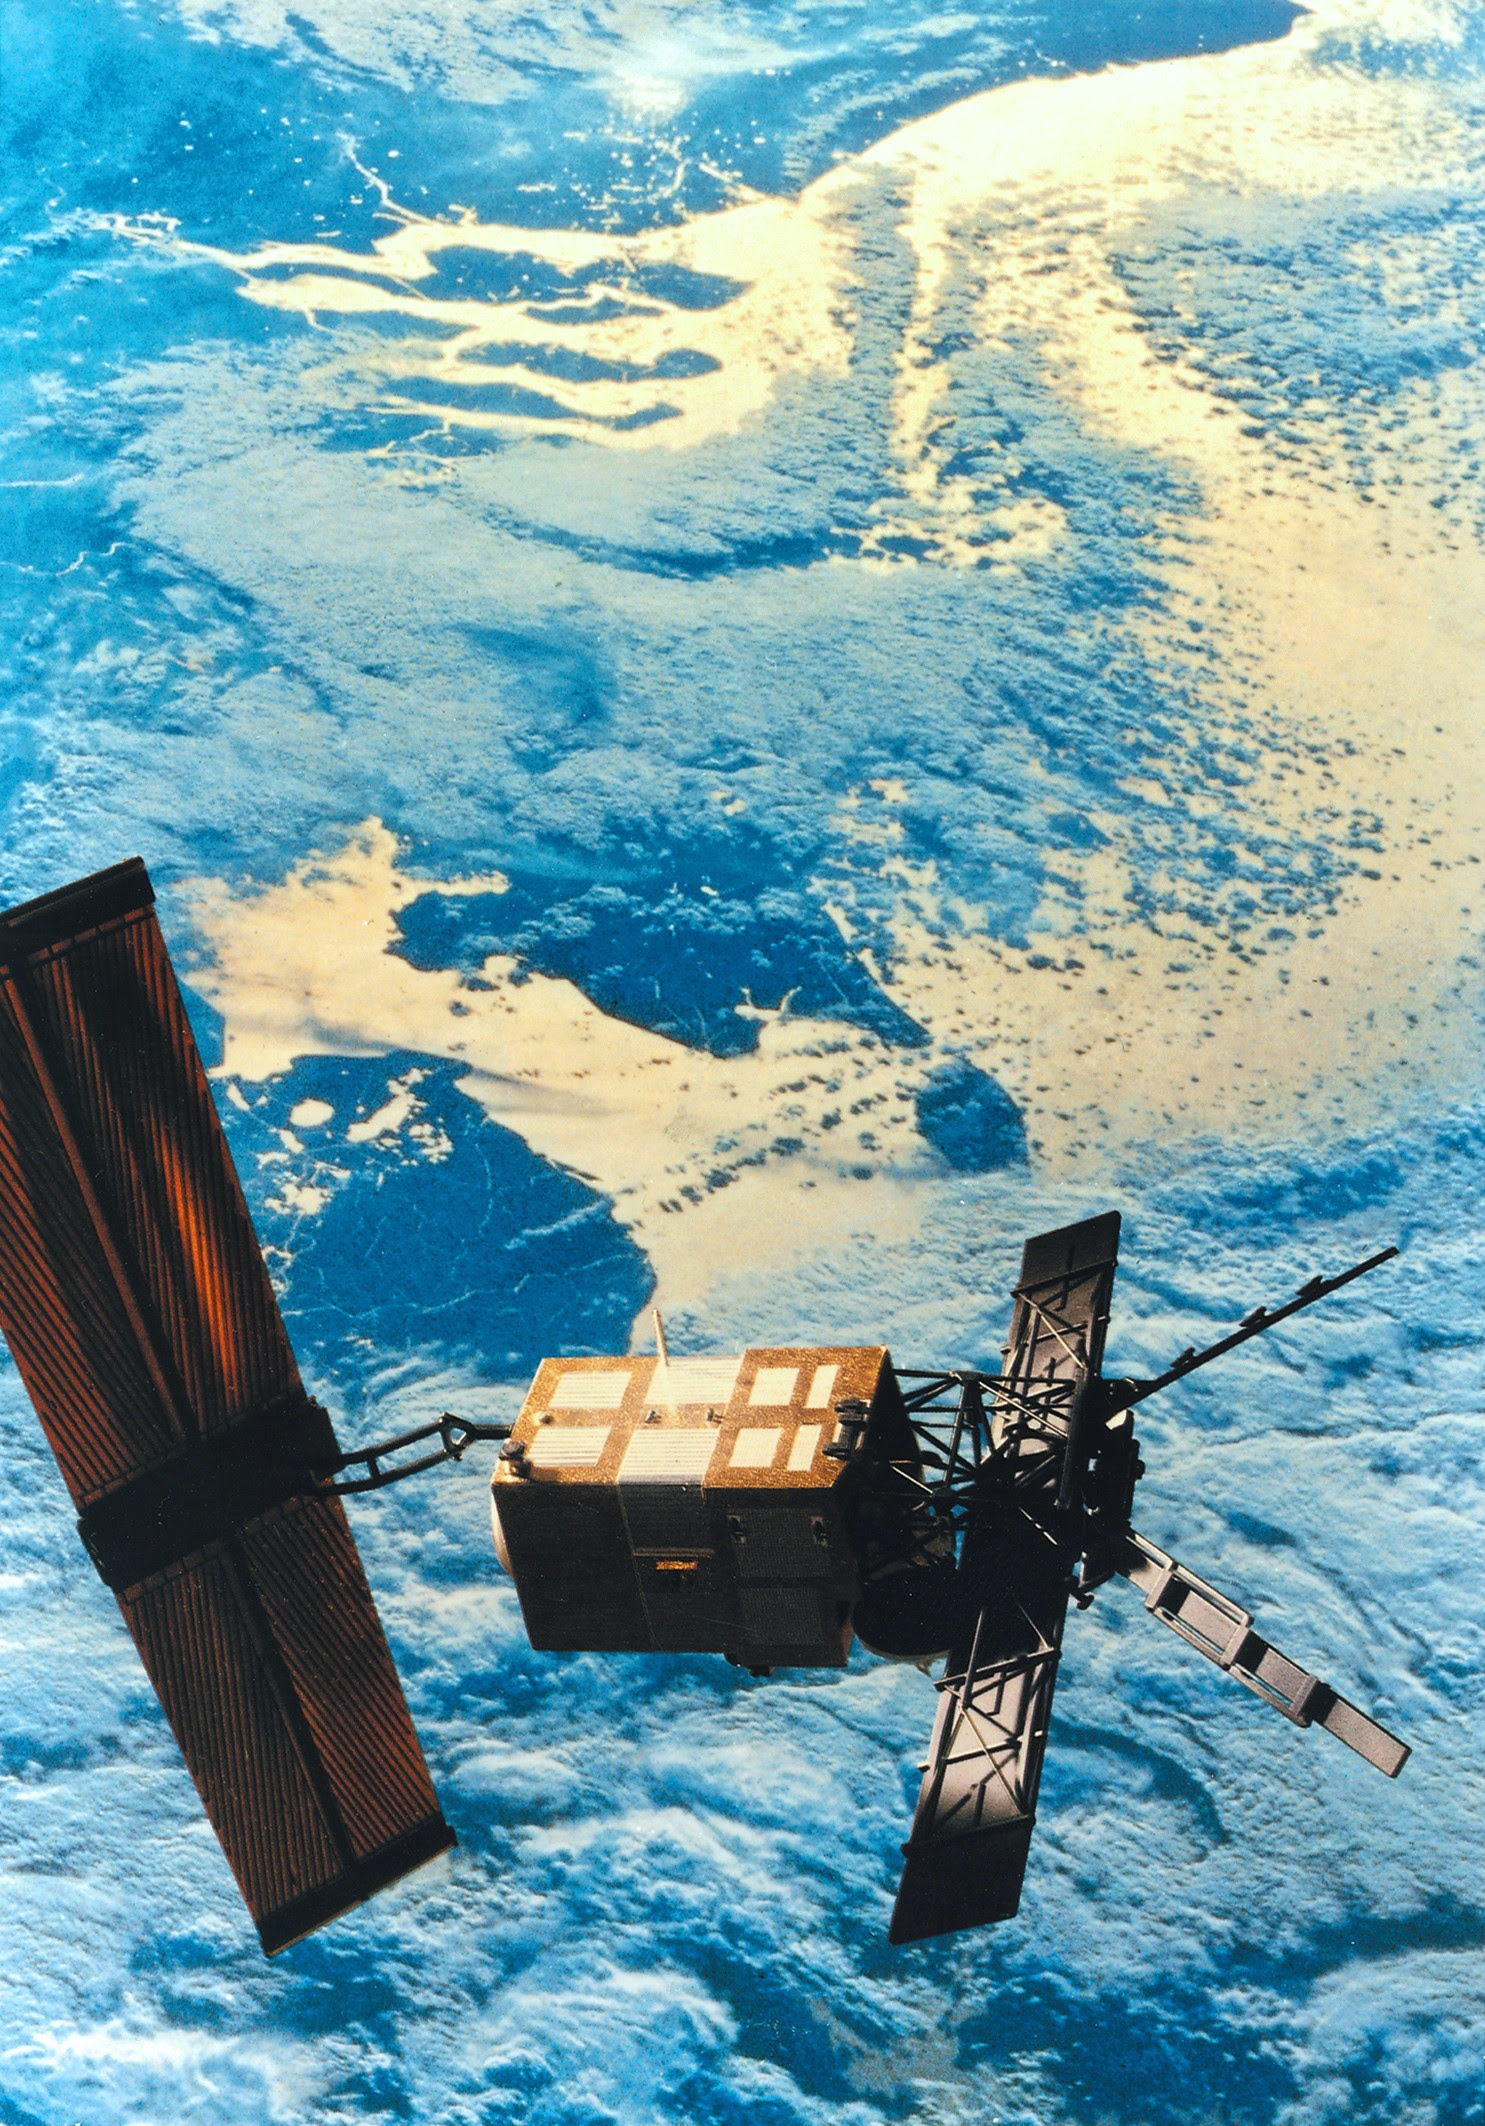 Airbus 30 años satelite europeo ERS1